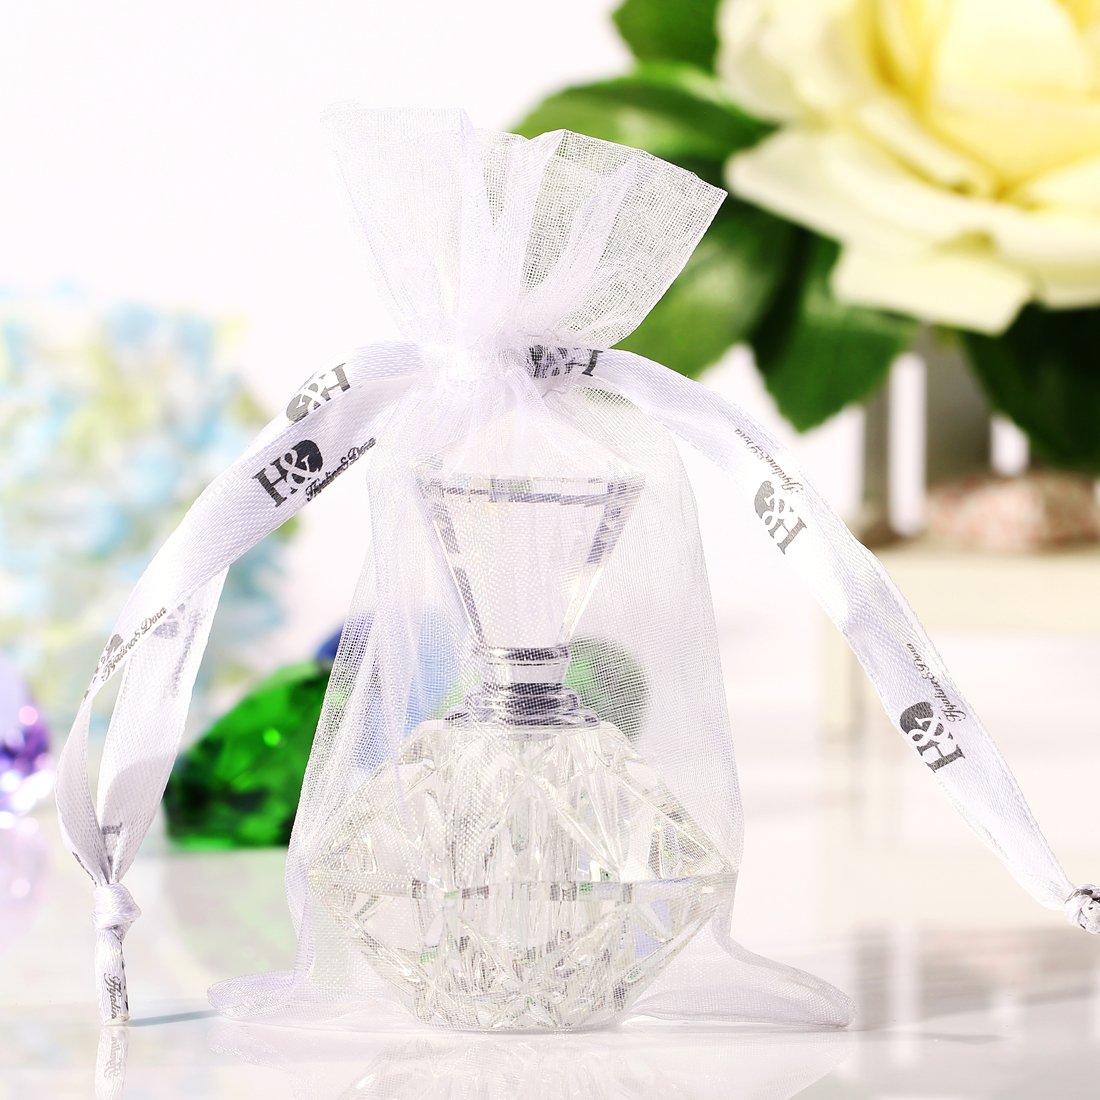 Minifrasco de perfume H&D de estilo vintage, vacío, rellenable.: Amazon.es: Hogar